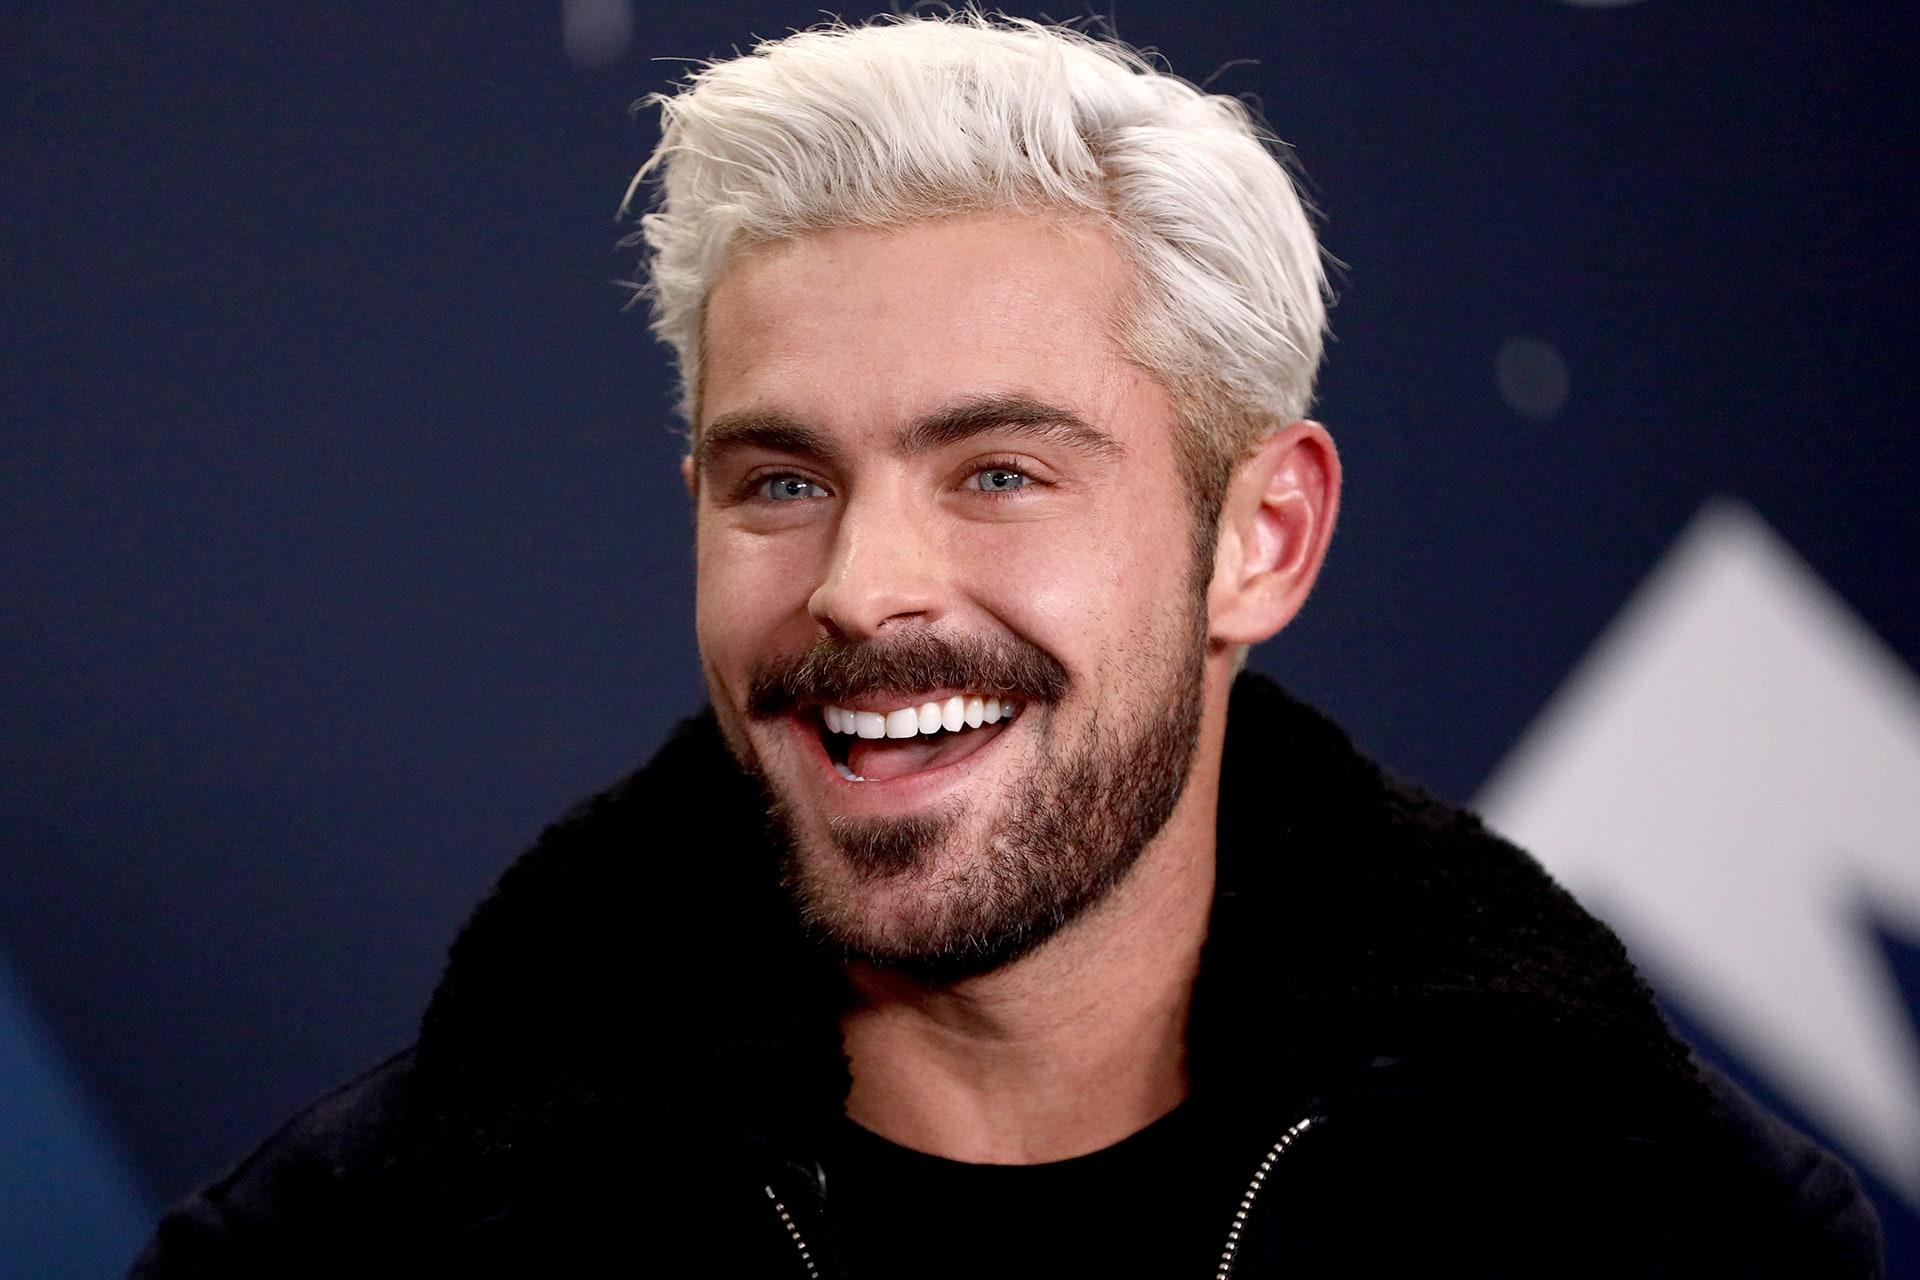 Man with blonde hair and scruffy beard